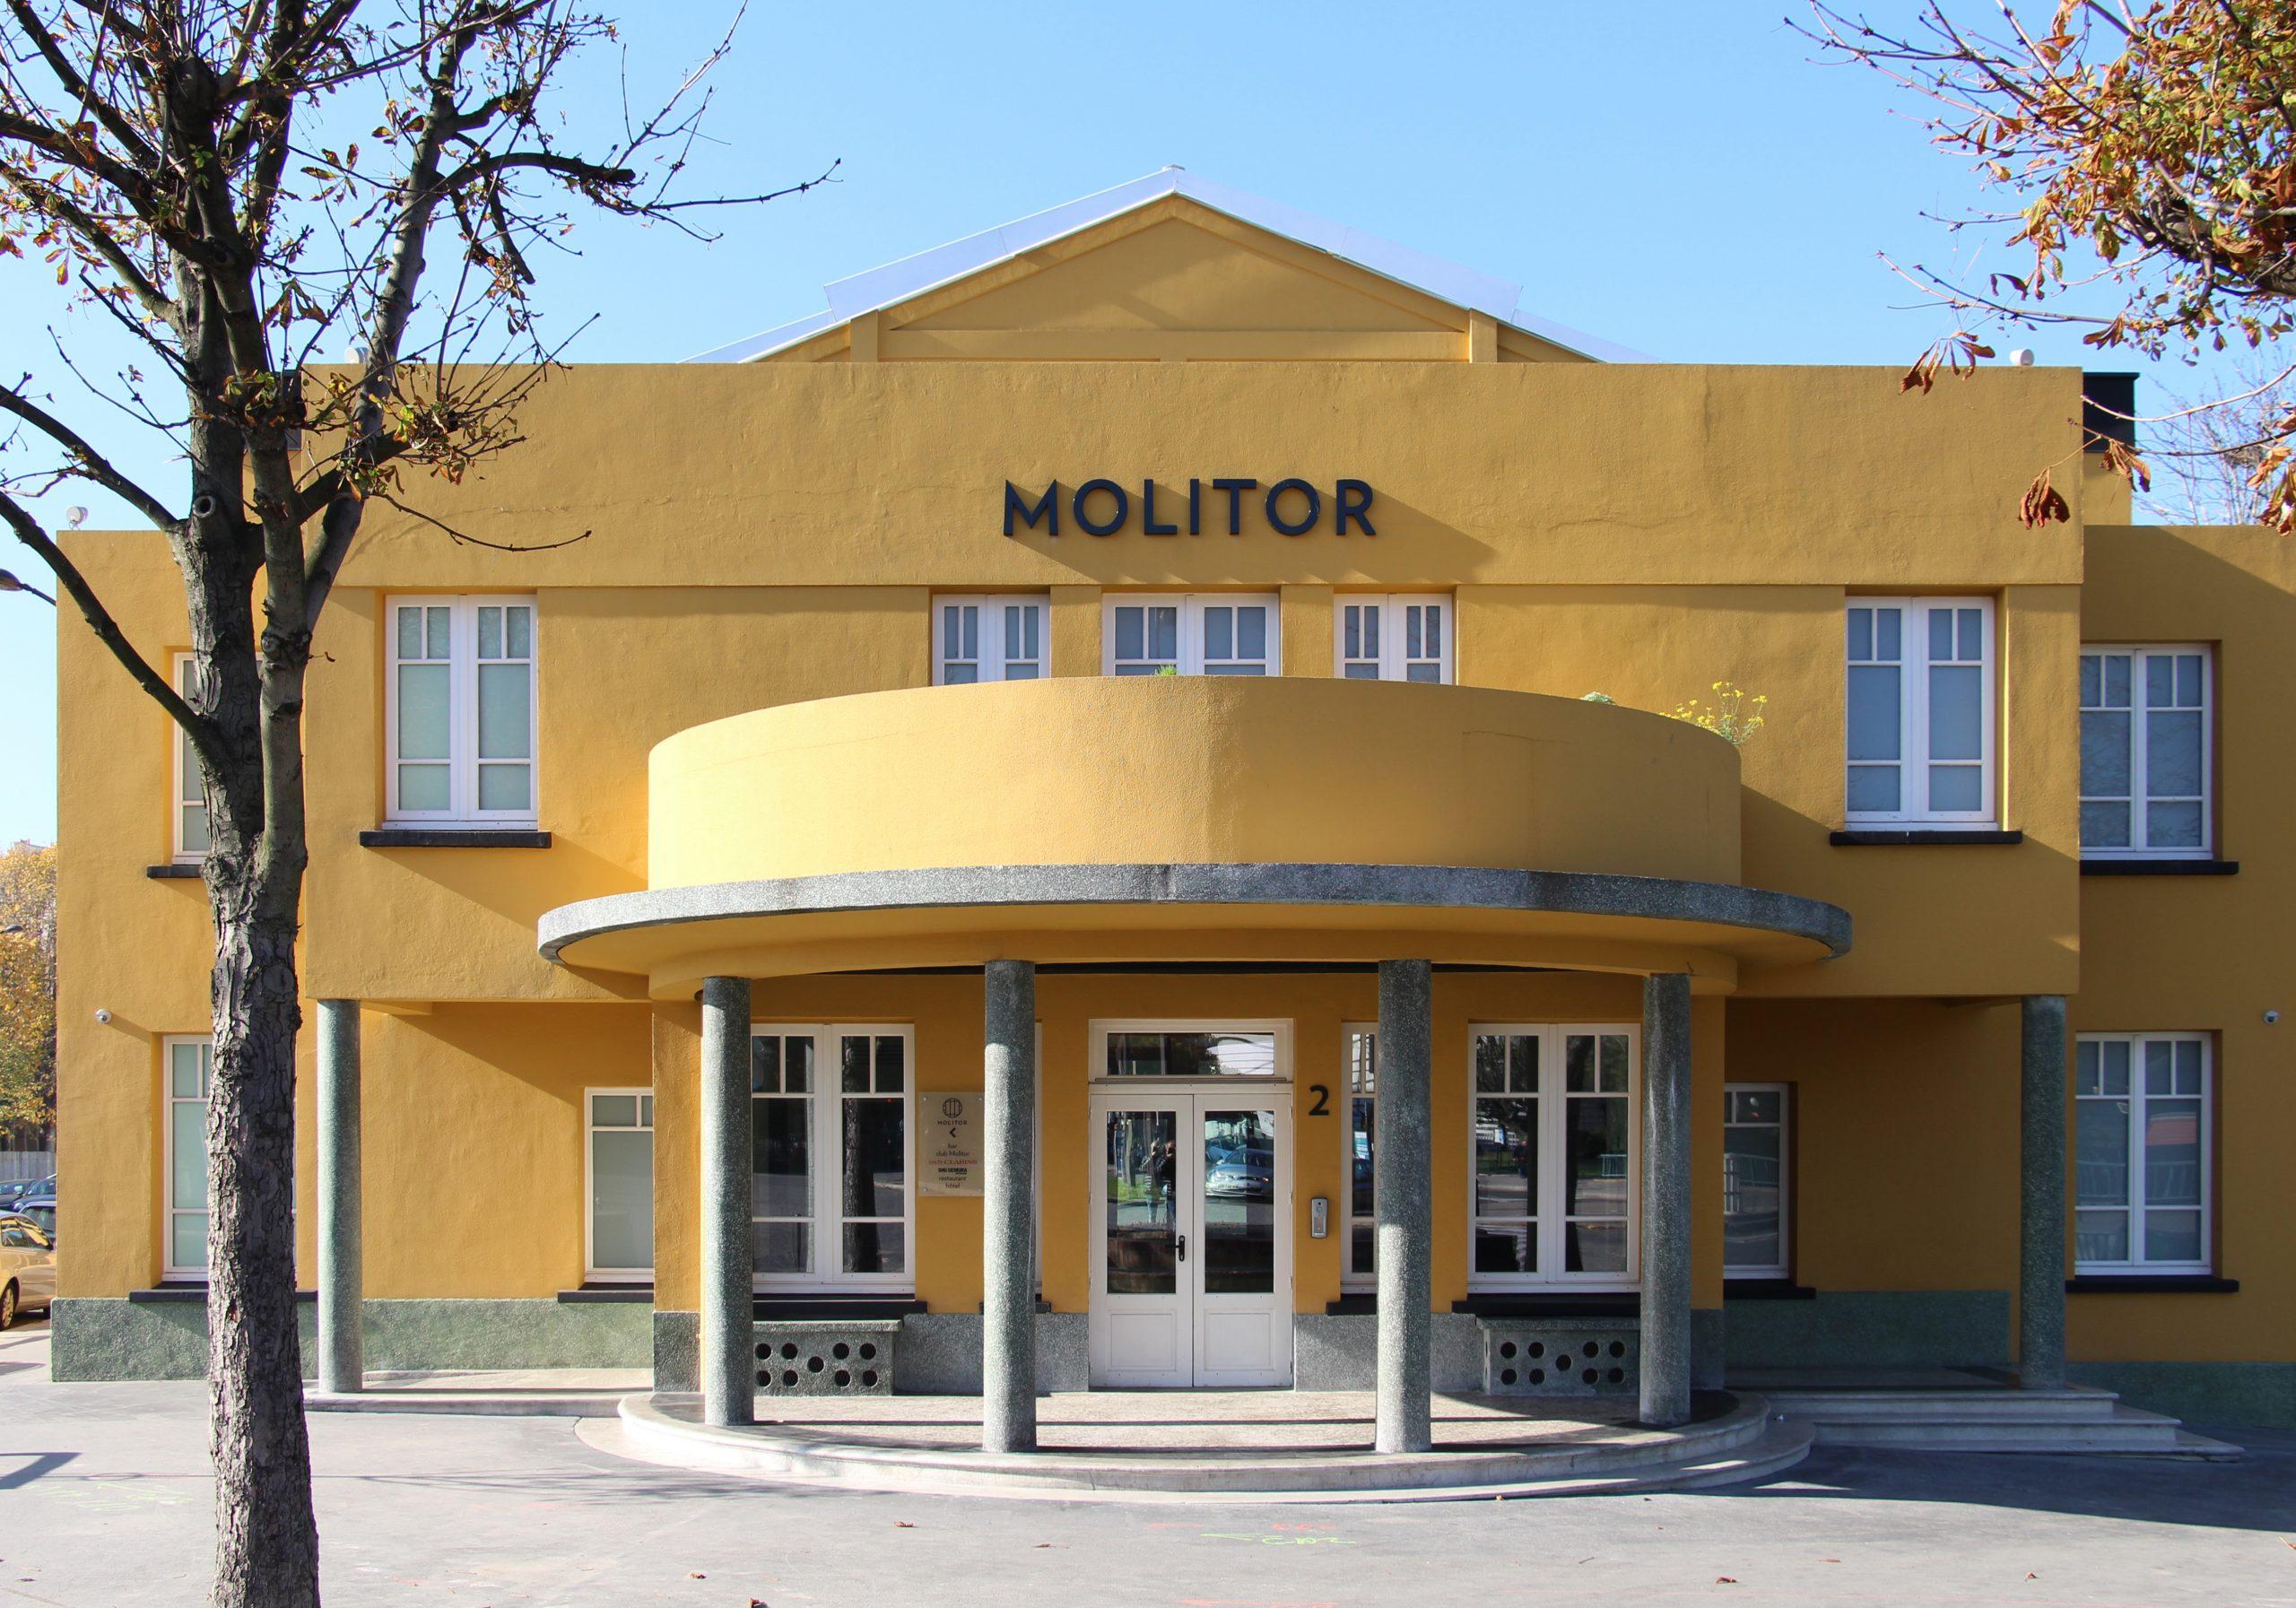 File:paris, Piscine Molitor, 1 November 2015 001.jpg ... concernant Restaurant Piscine Molitor